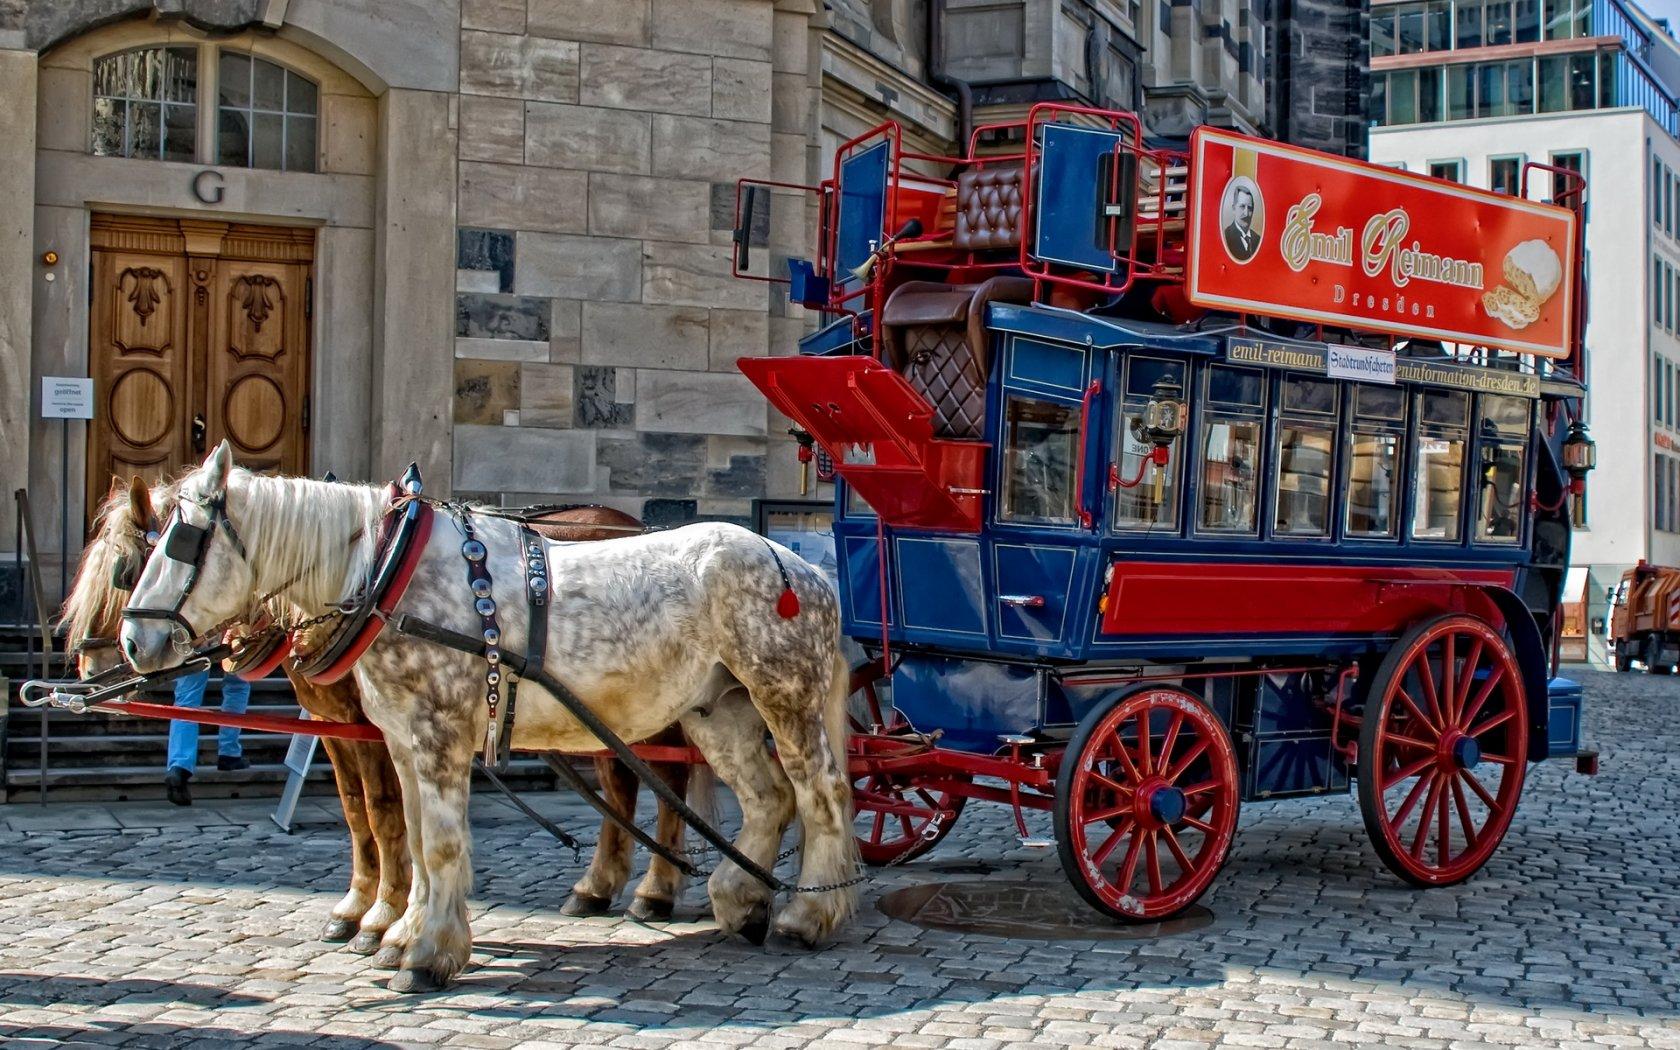 Drawn vehicle vehicle Free HD Drawn Vehicle Horse